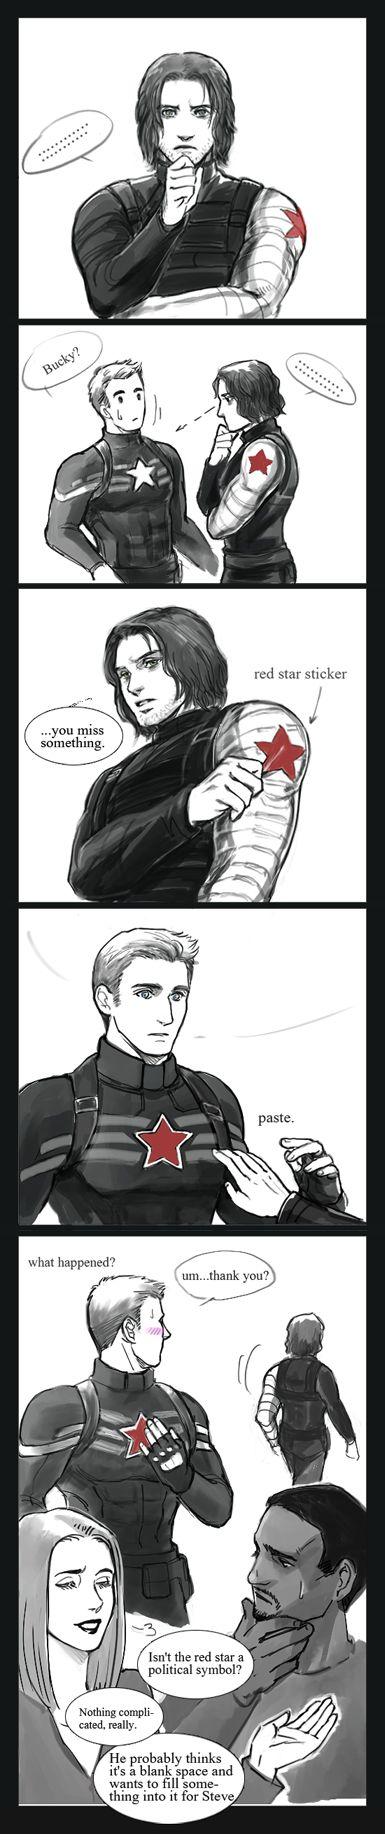 Natasha - SYMBOLISM......Ohhh even this gives me Bucky feels